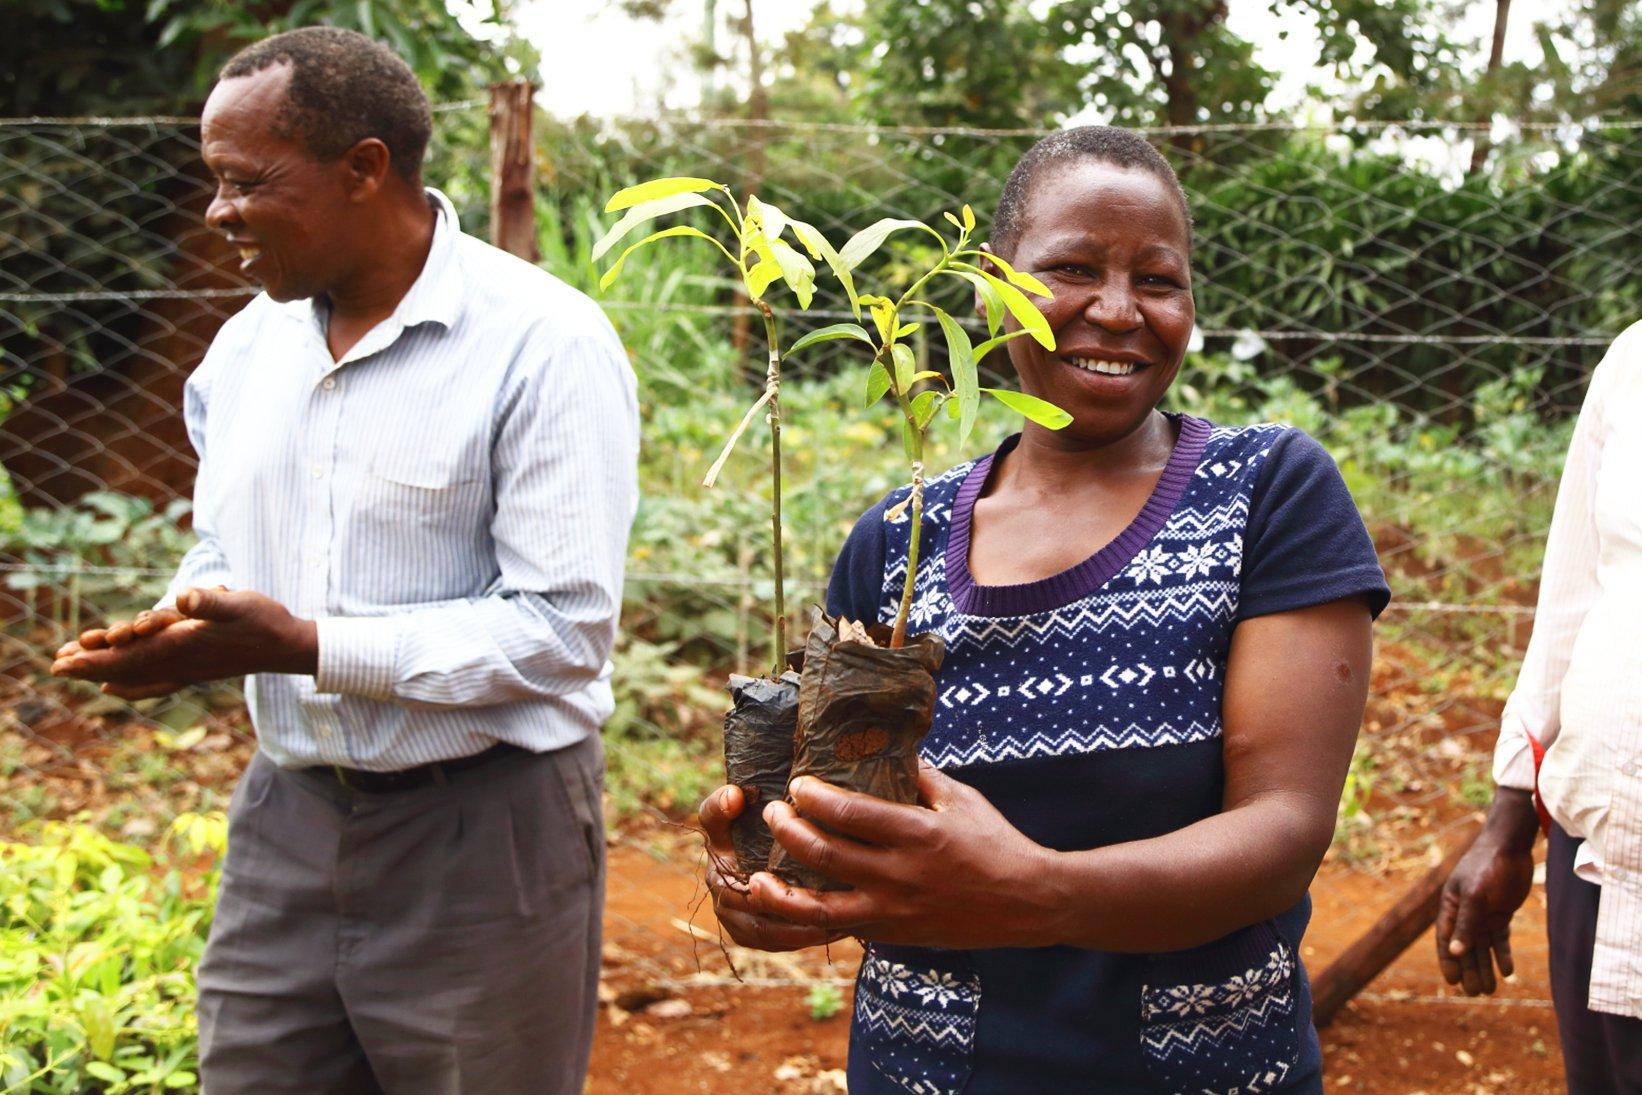 kenya_-_a_woman_receiving_two_saplings_from_a_treedom_tree_nursery.jpg__1642x1095_q85_crop_subsampling-2_upscale.jpg